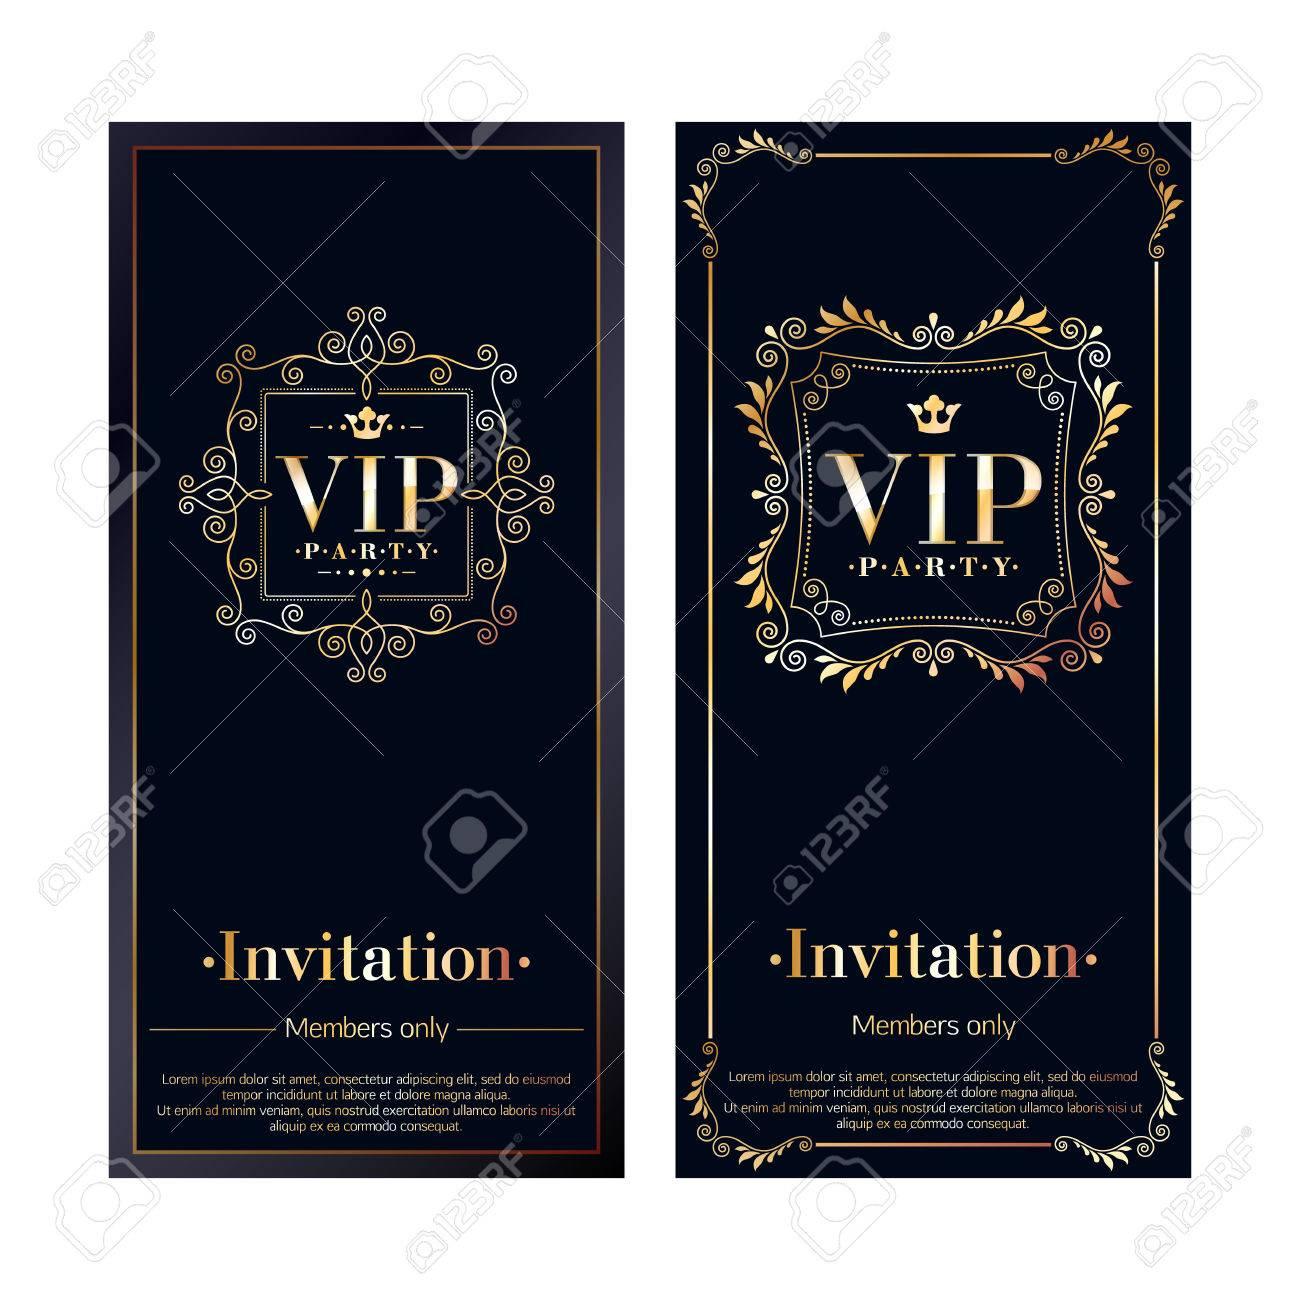 Vip zone members premium invitation cards black and golden design vip zone members premium invitation cards black and golden design template set classic floral stopboris Choice Image